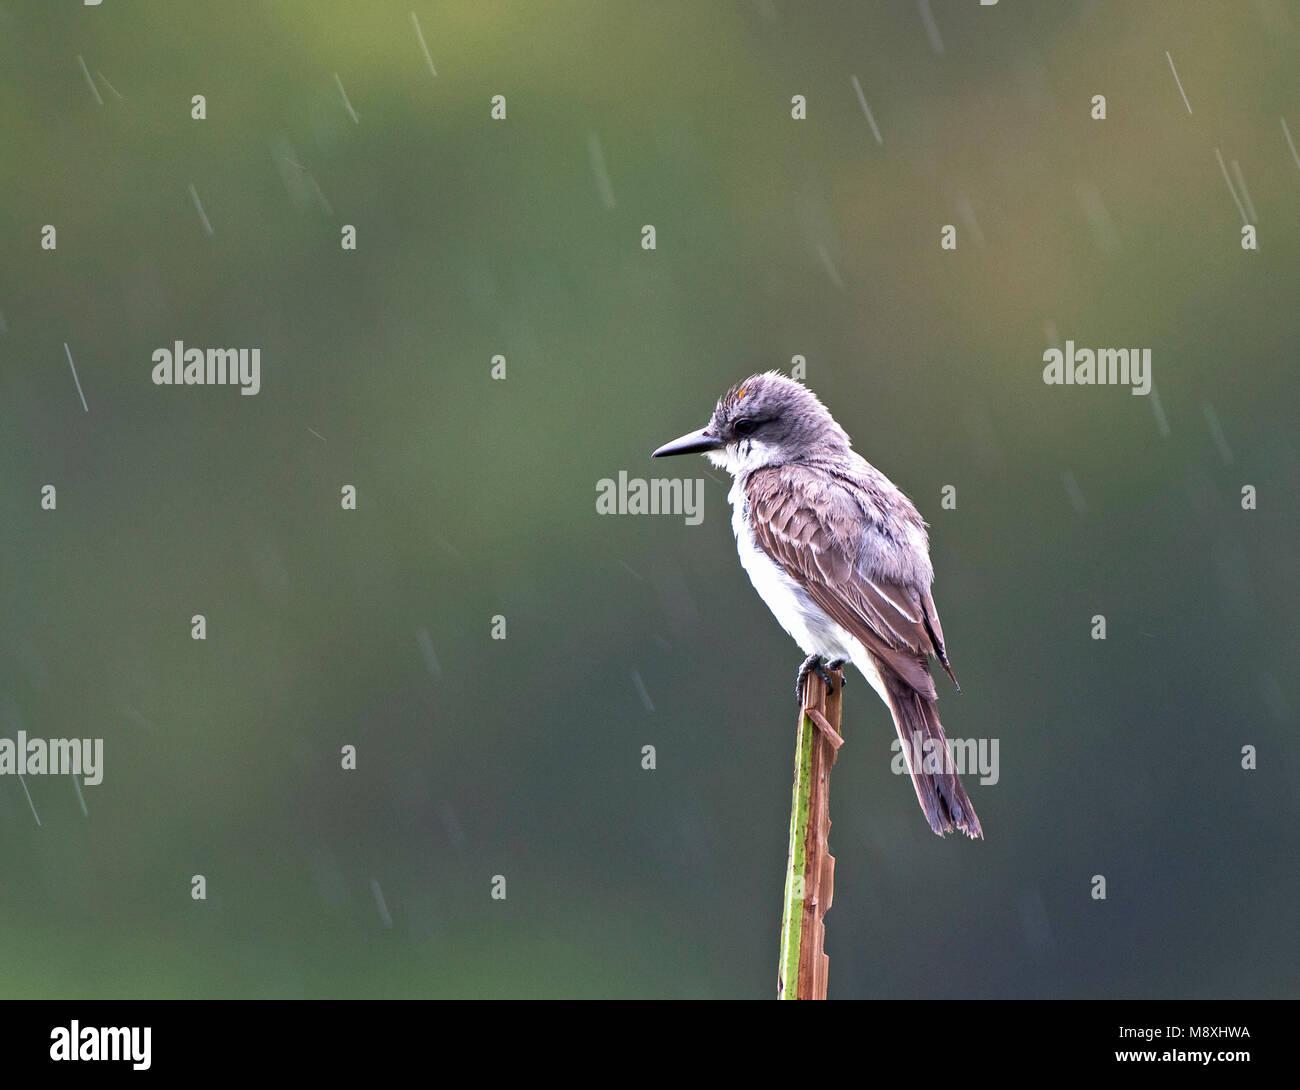 Grijze koningstiran zittend in de regen, Gray Kingbird perched in the rain - Stock Image